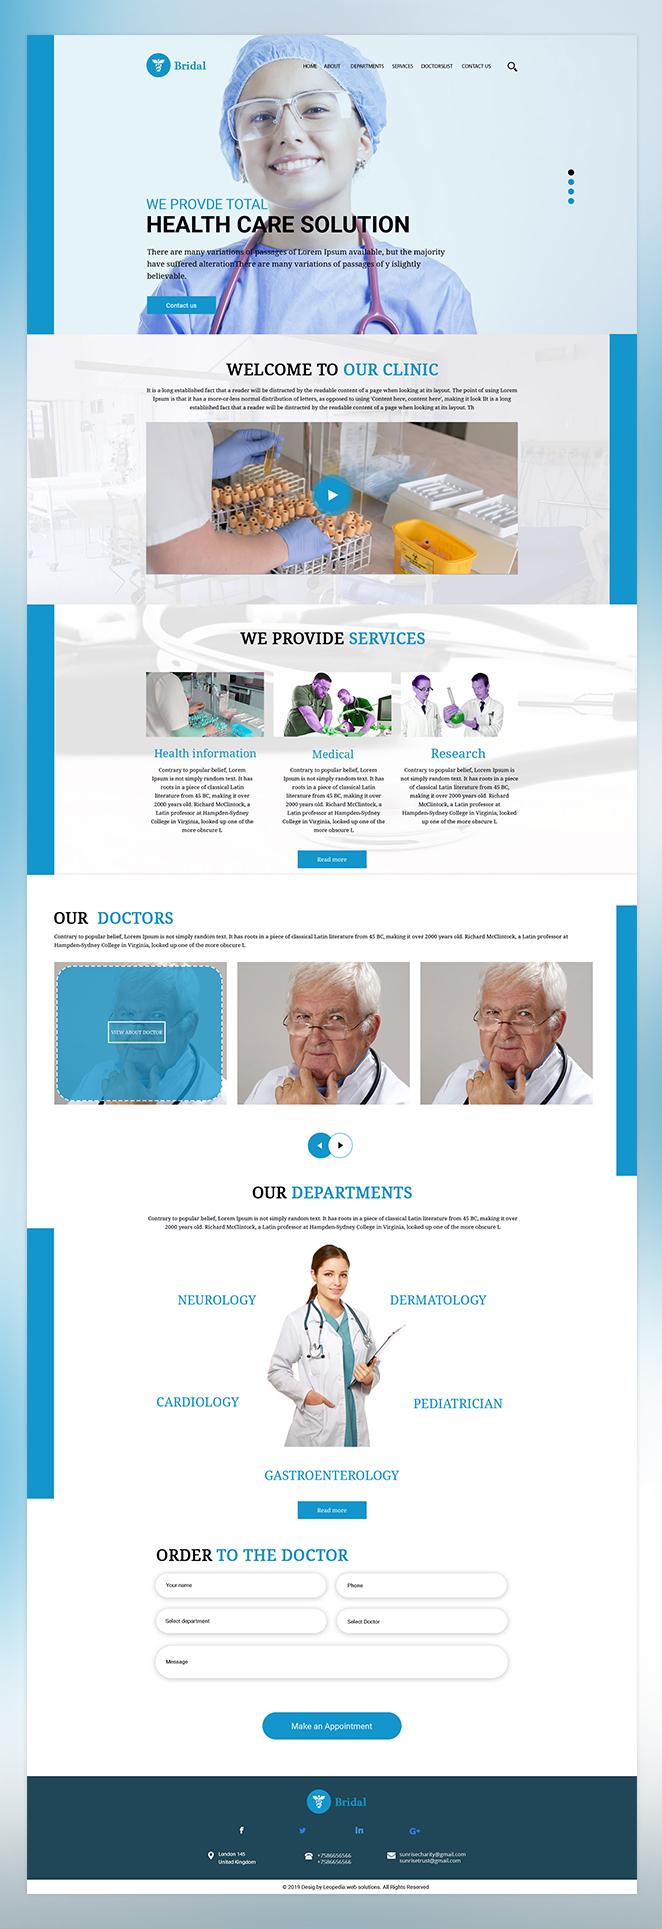 Bridal health care psd template